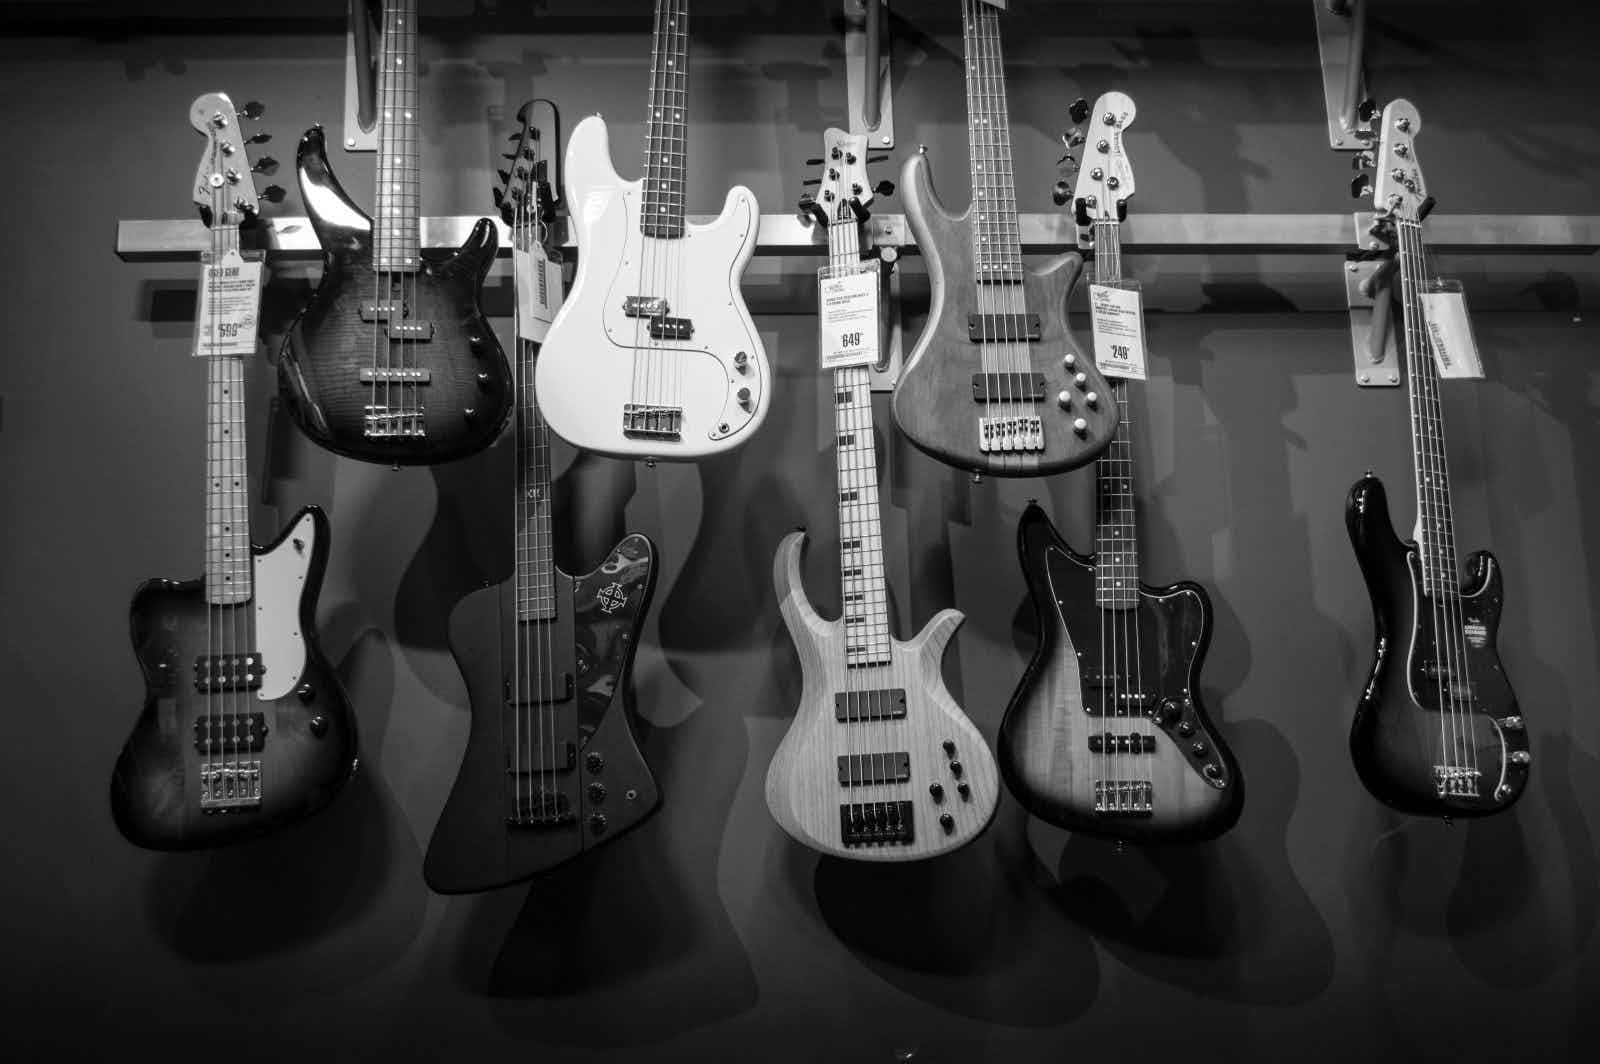 rockfoto.jpg